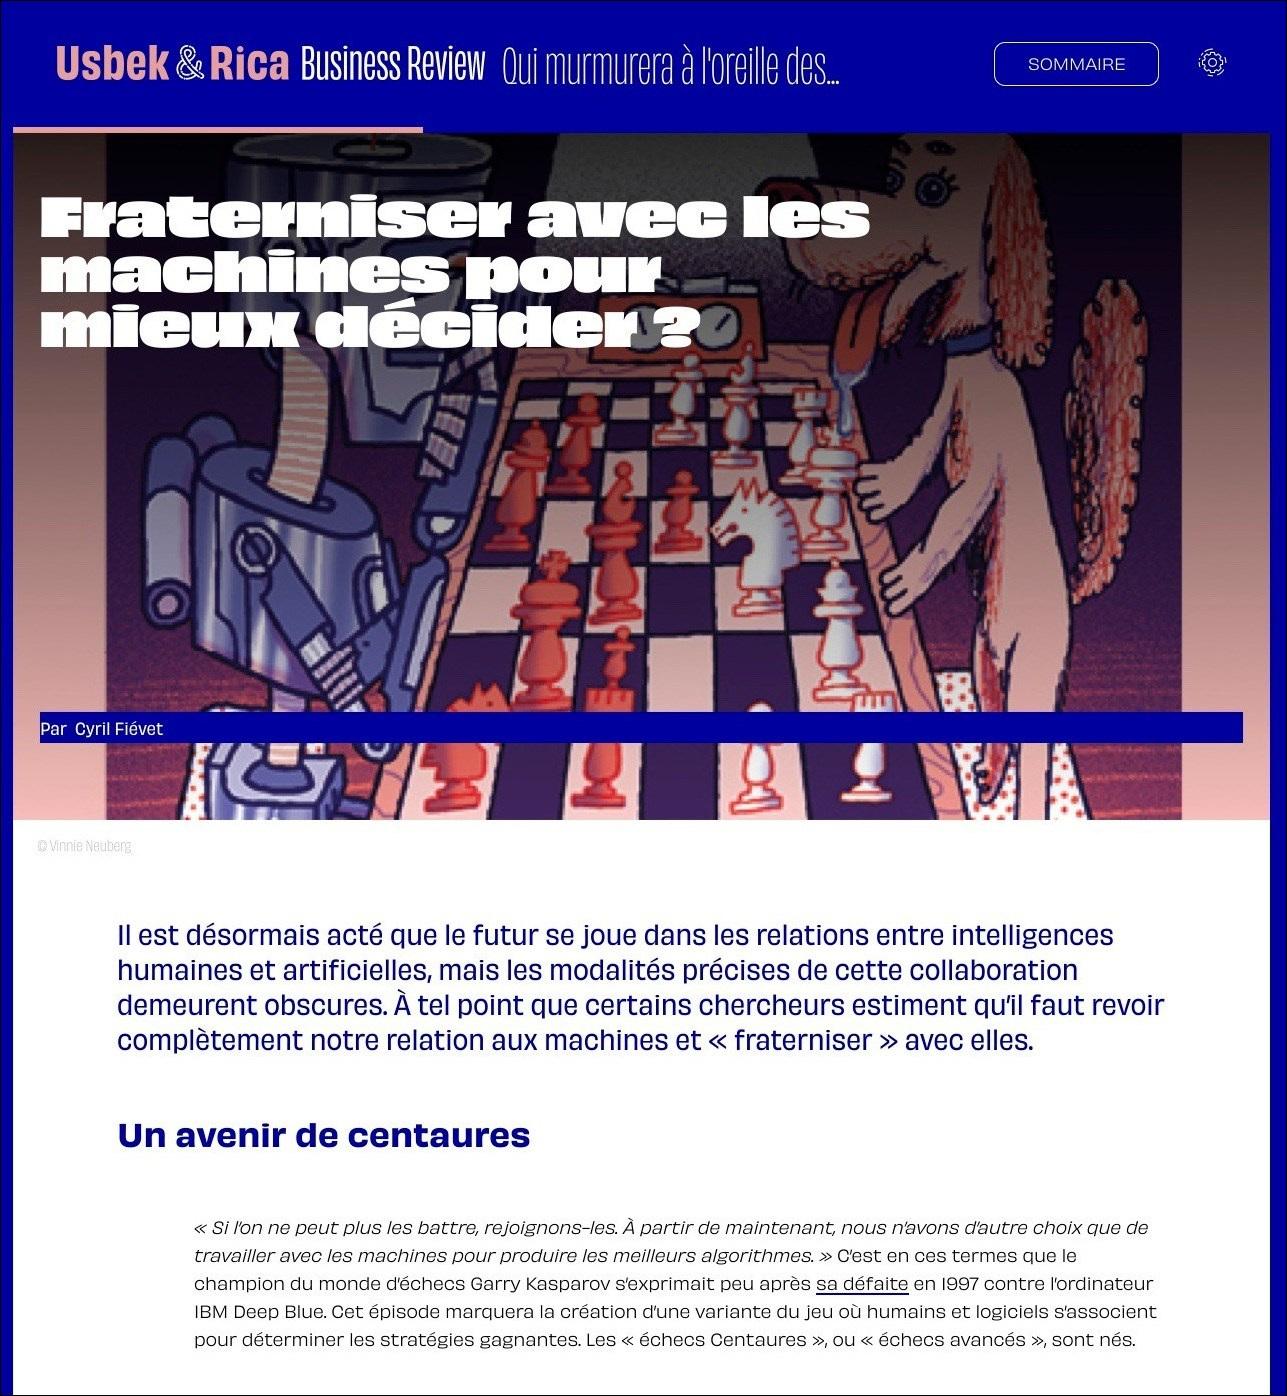 Usbek & Rica Business Review – IA